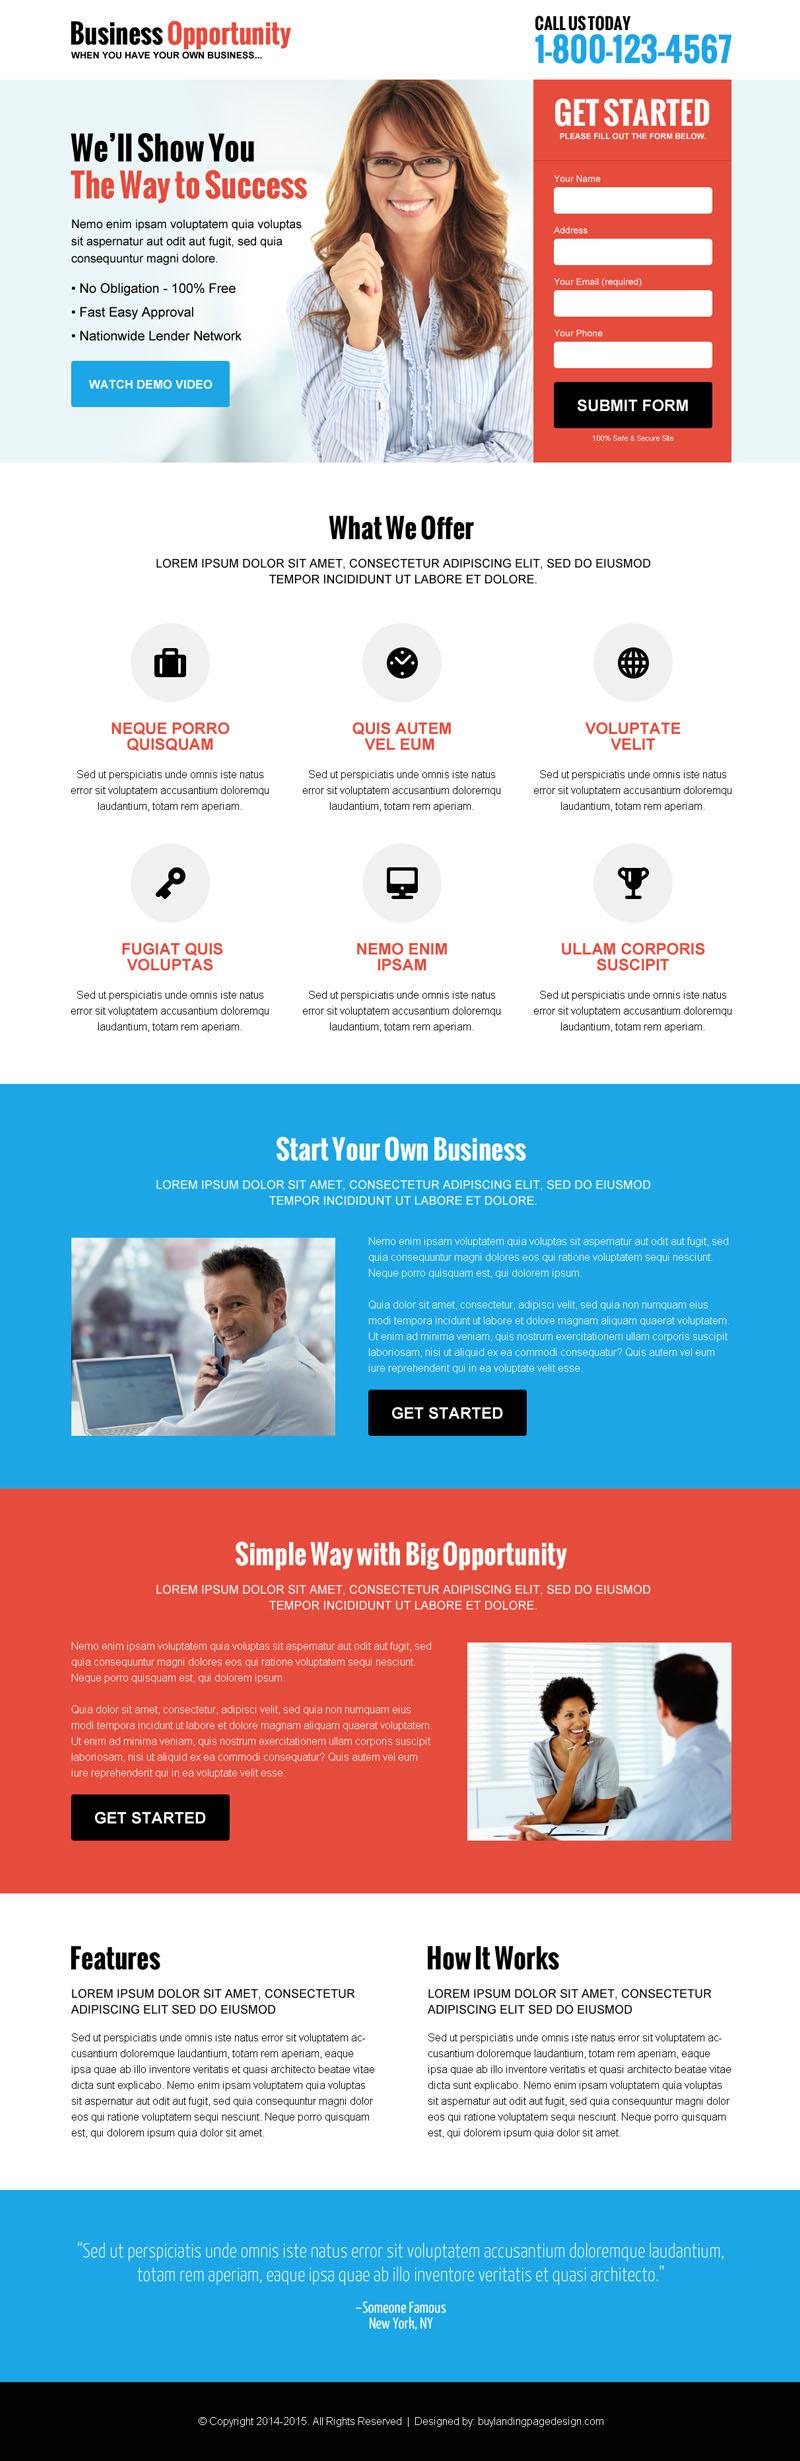 best-business-marketing-lead-generation-converting-responsive-landing-page-design-011